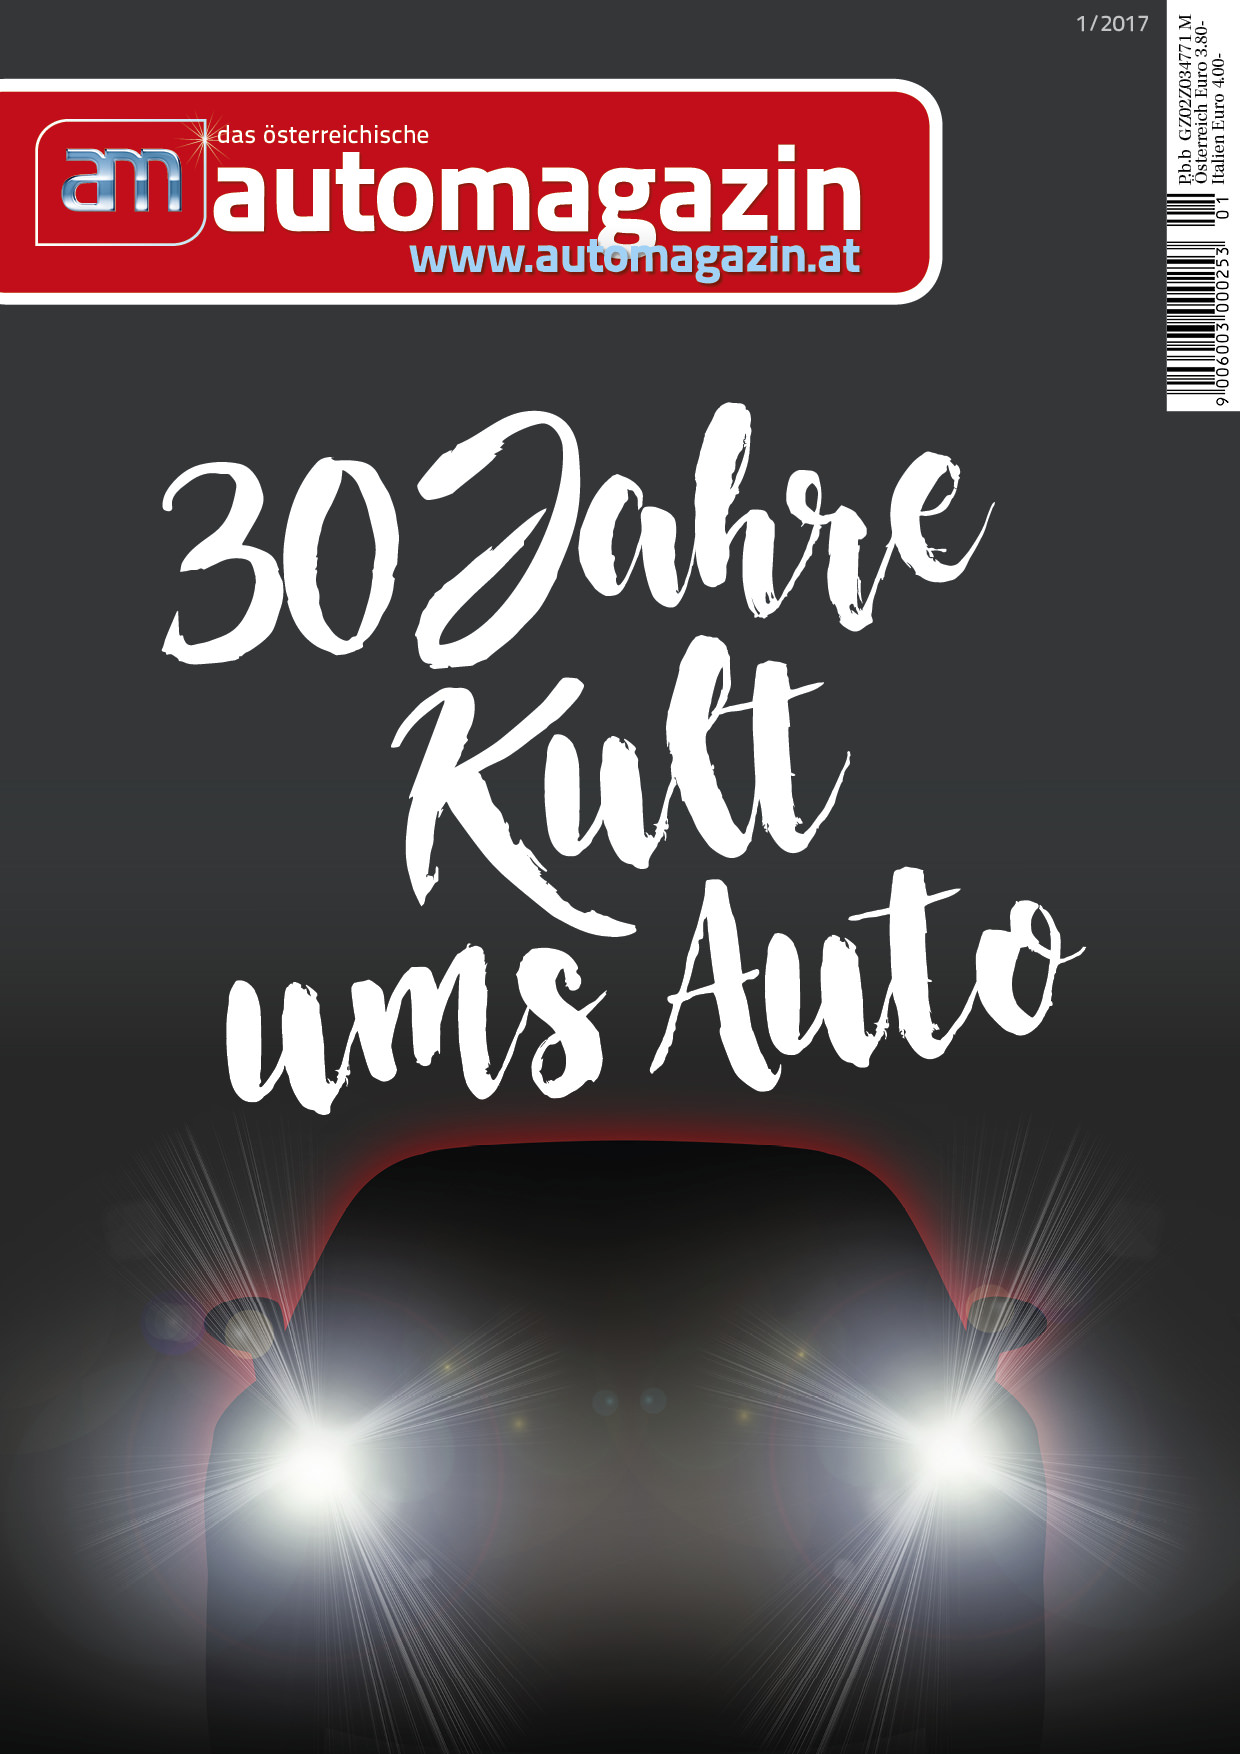 Automagazin 01.2017